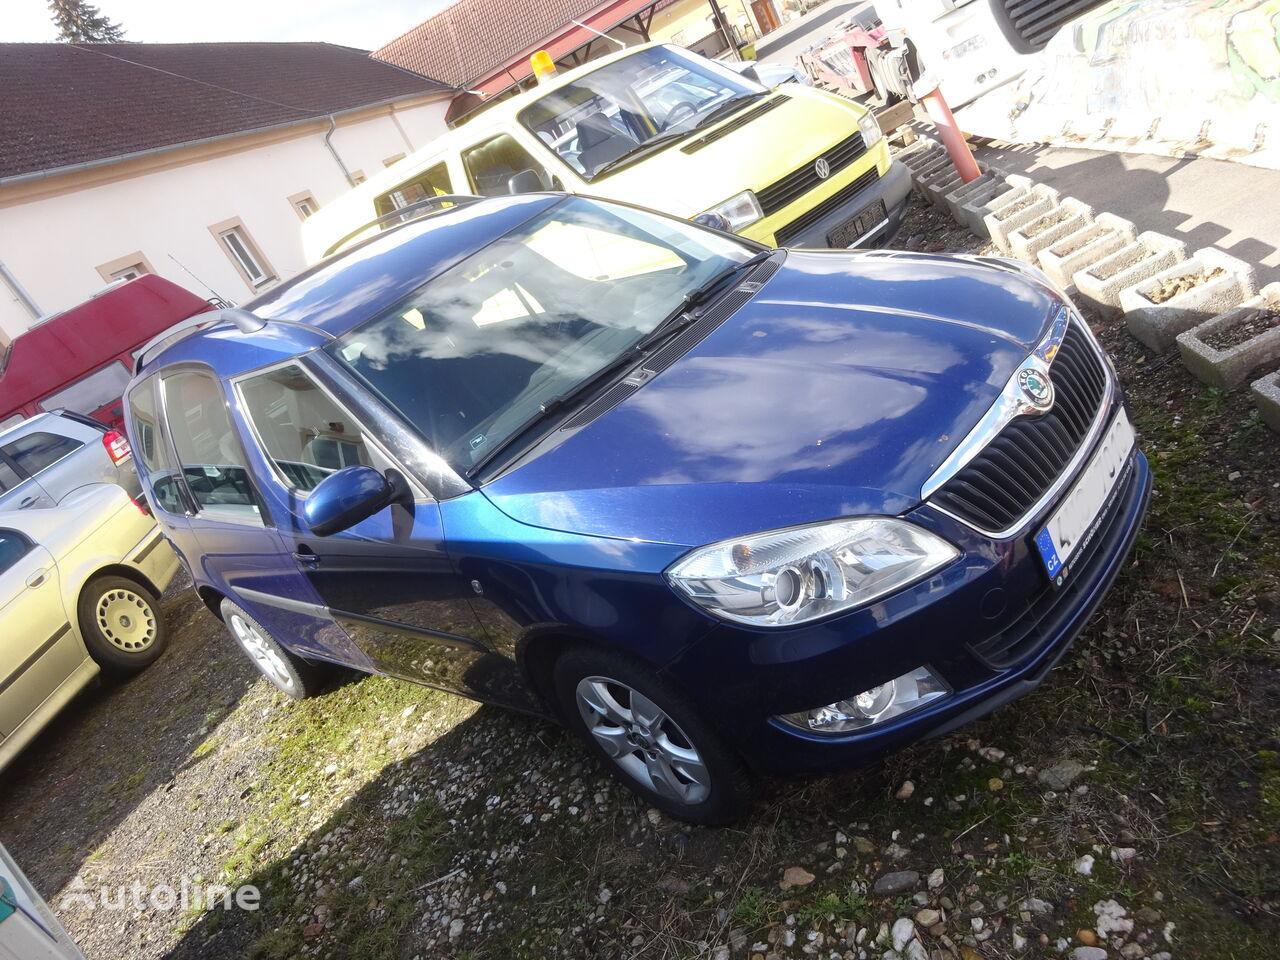 SKODA ROOMSTER 1.2 TSI estate car